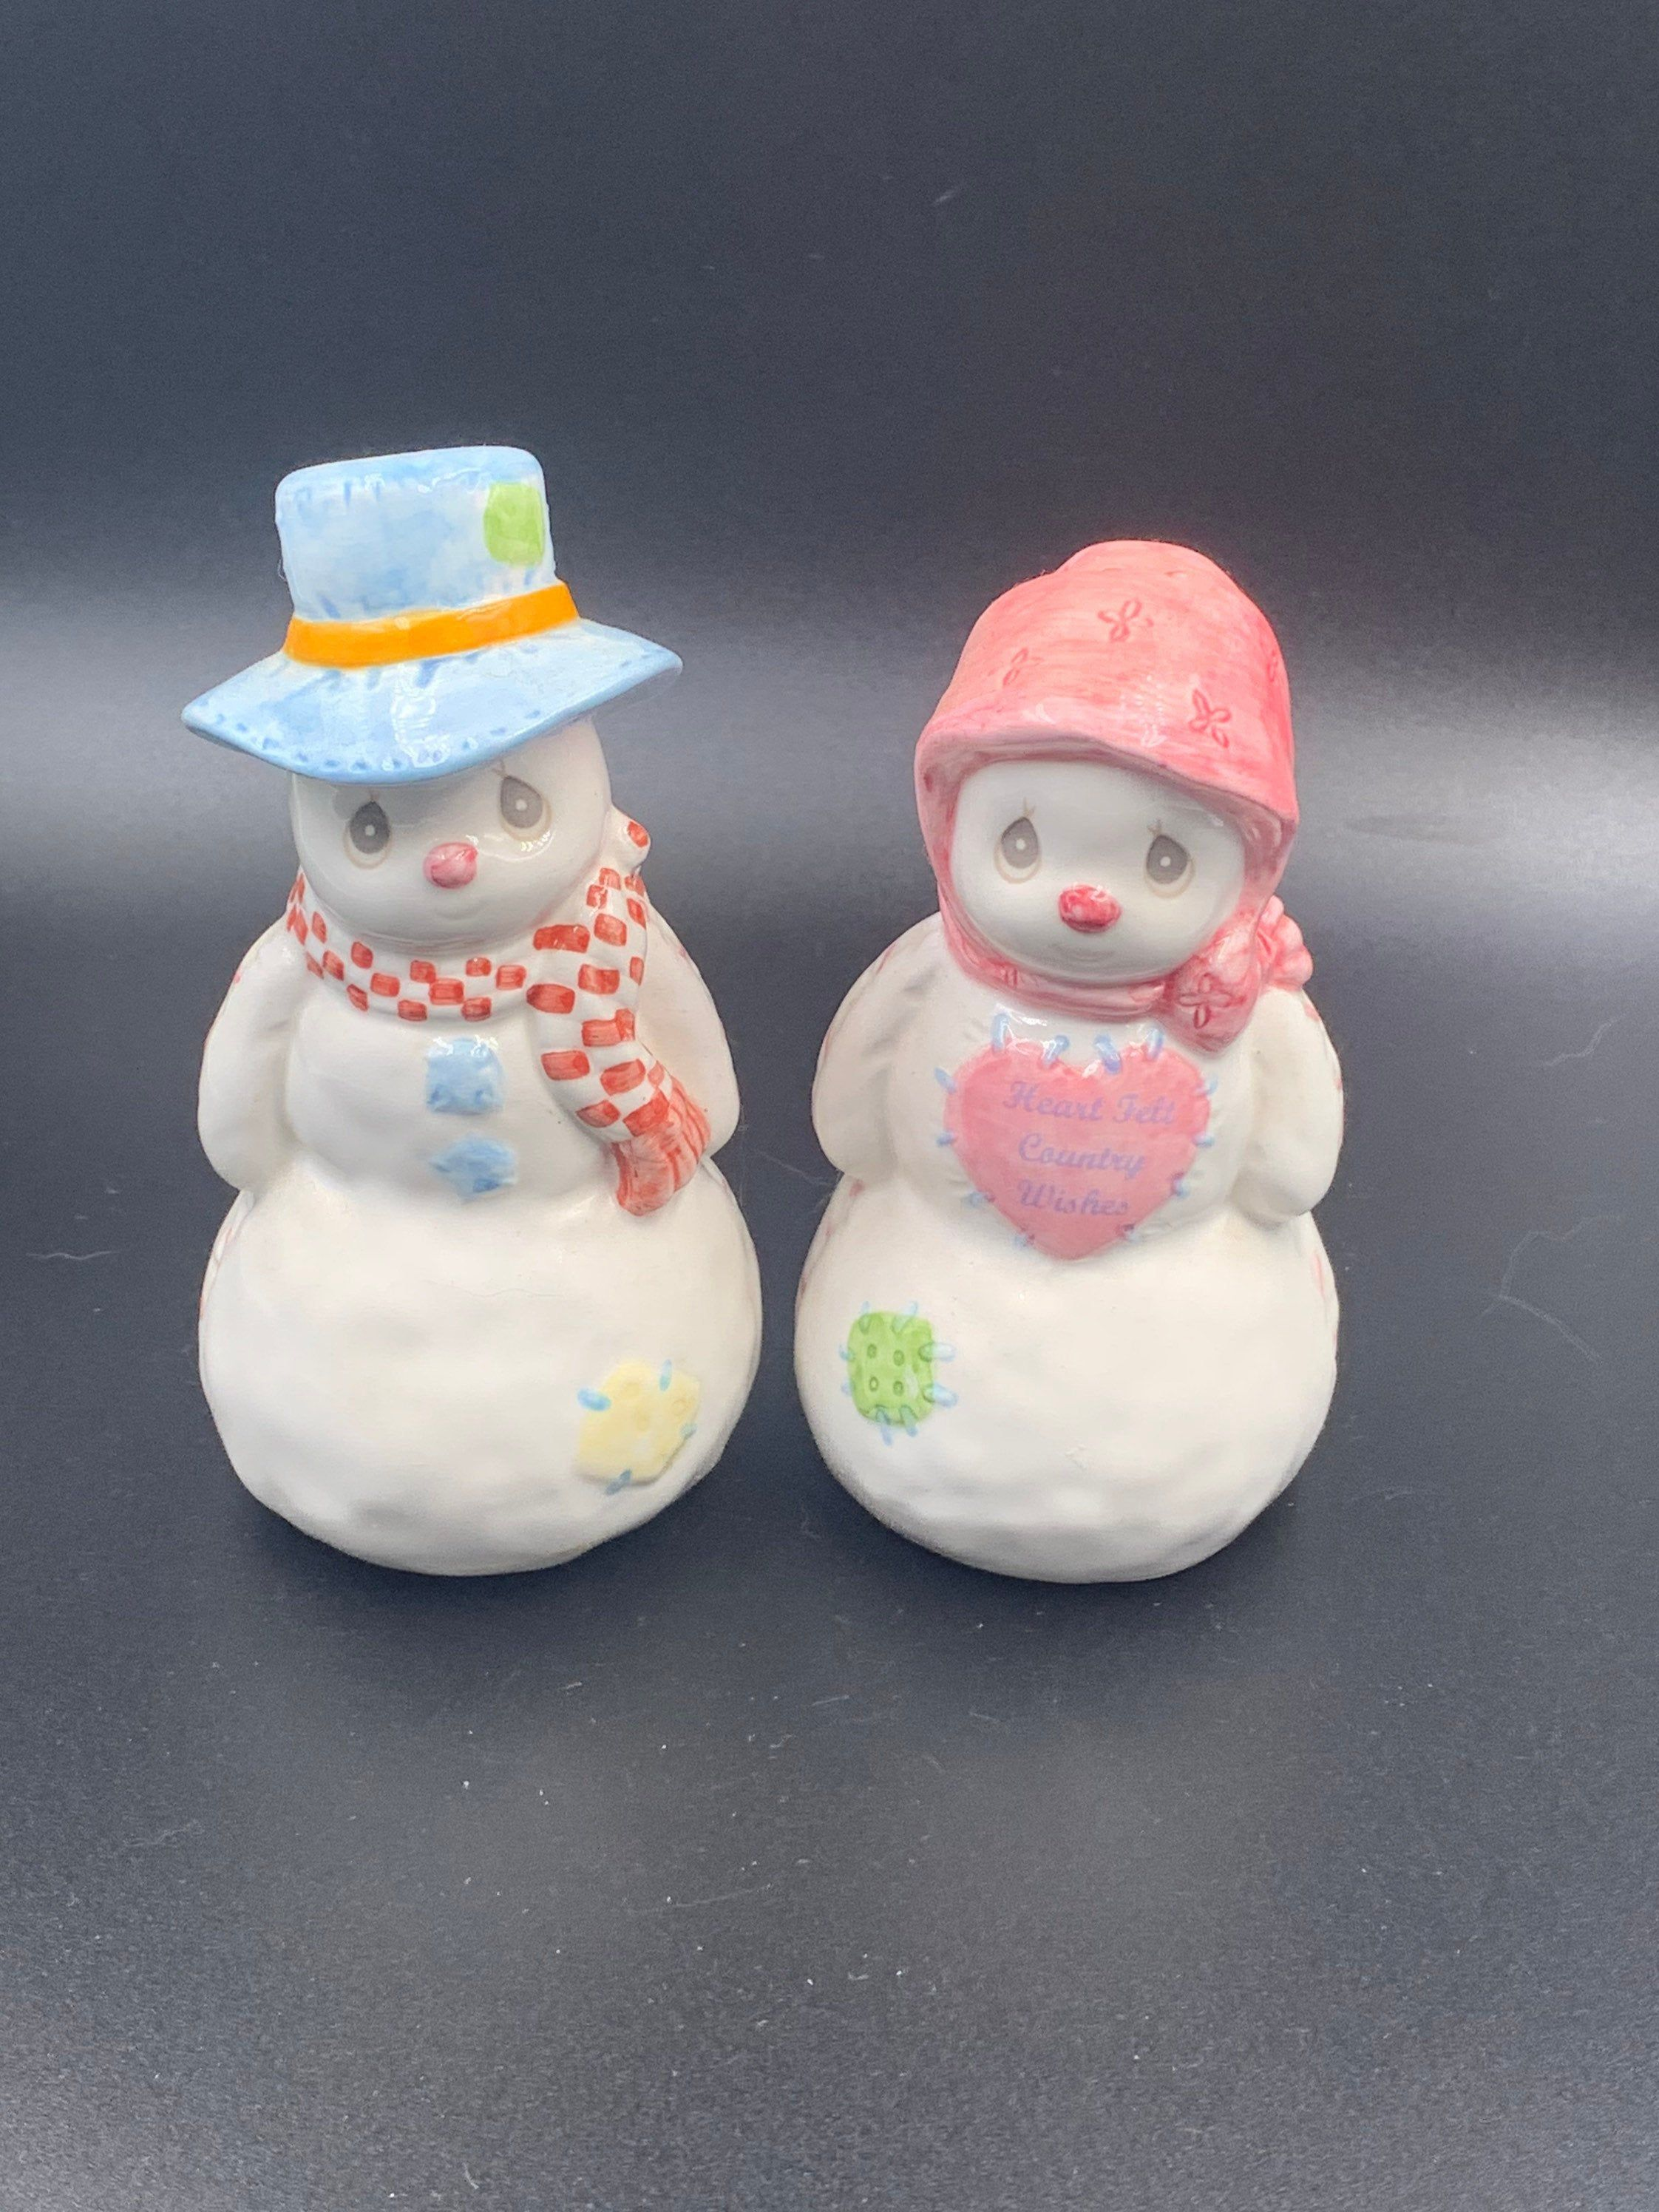 Precious Moments Vintage Christmas Ornaments 2020 Vintage 1998 Precious Moments Snowmen Salt & Pepper Shakers   Etsy